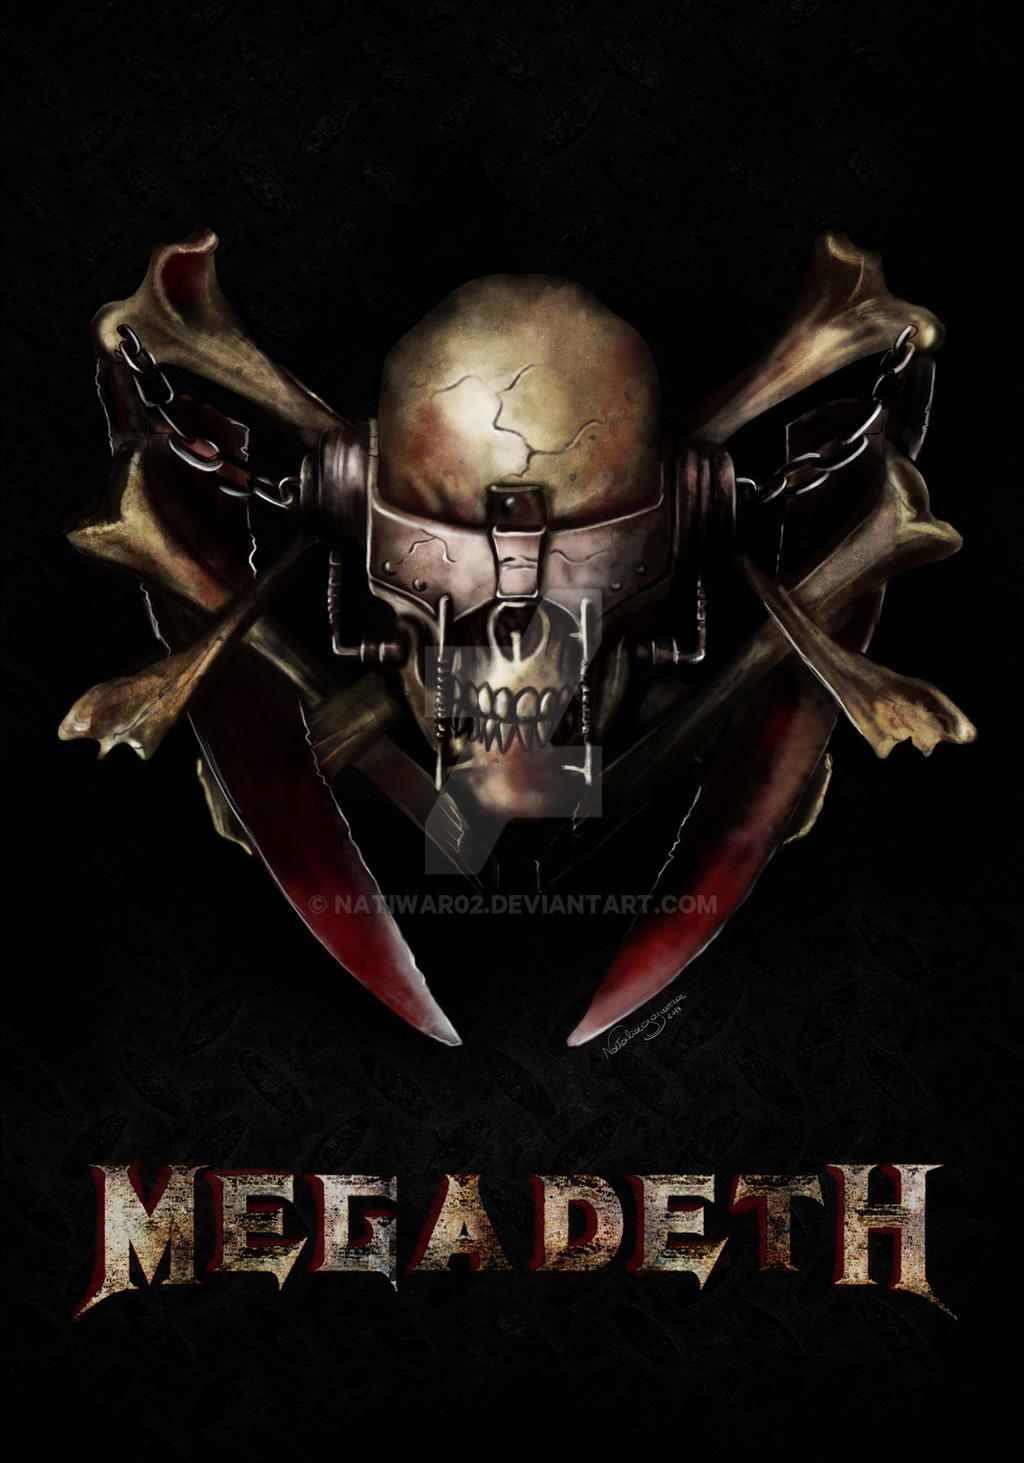 Megadeth by natiwar02